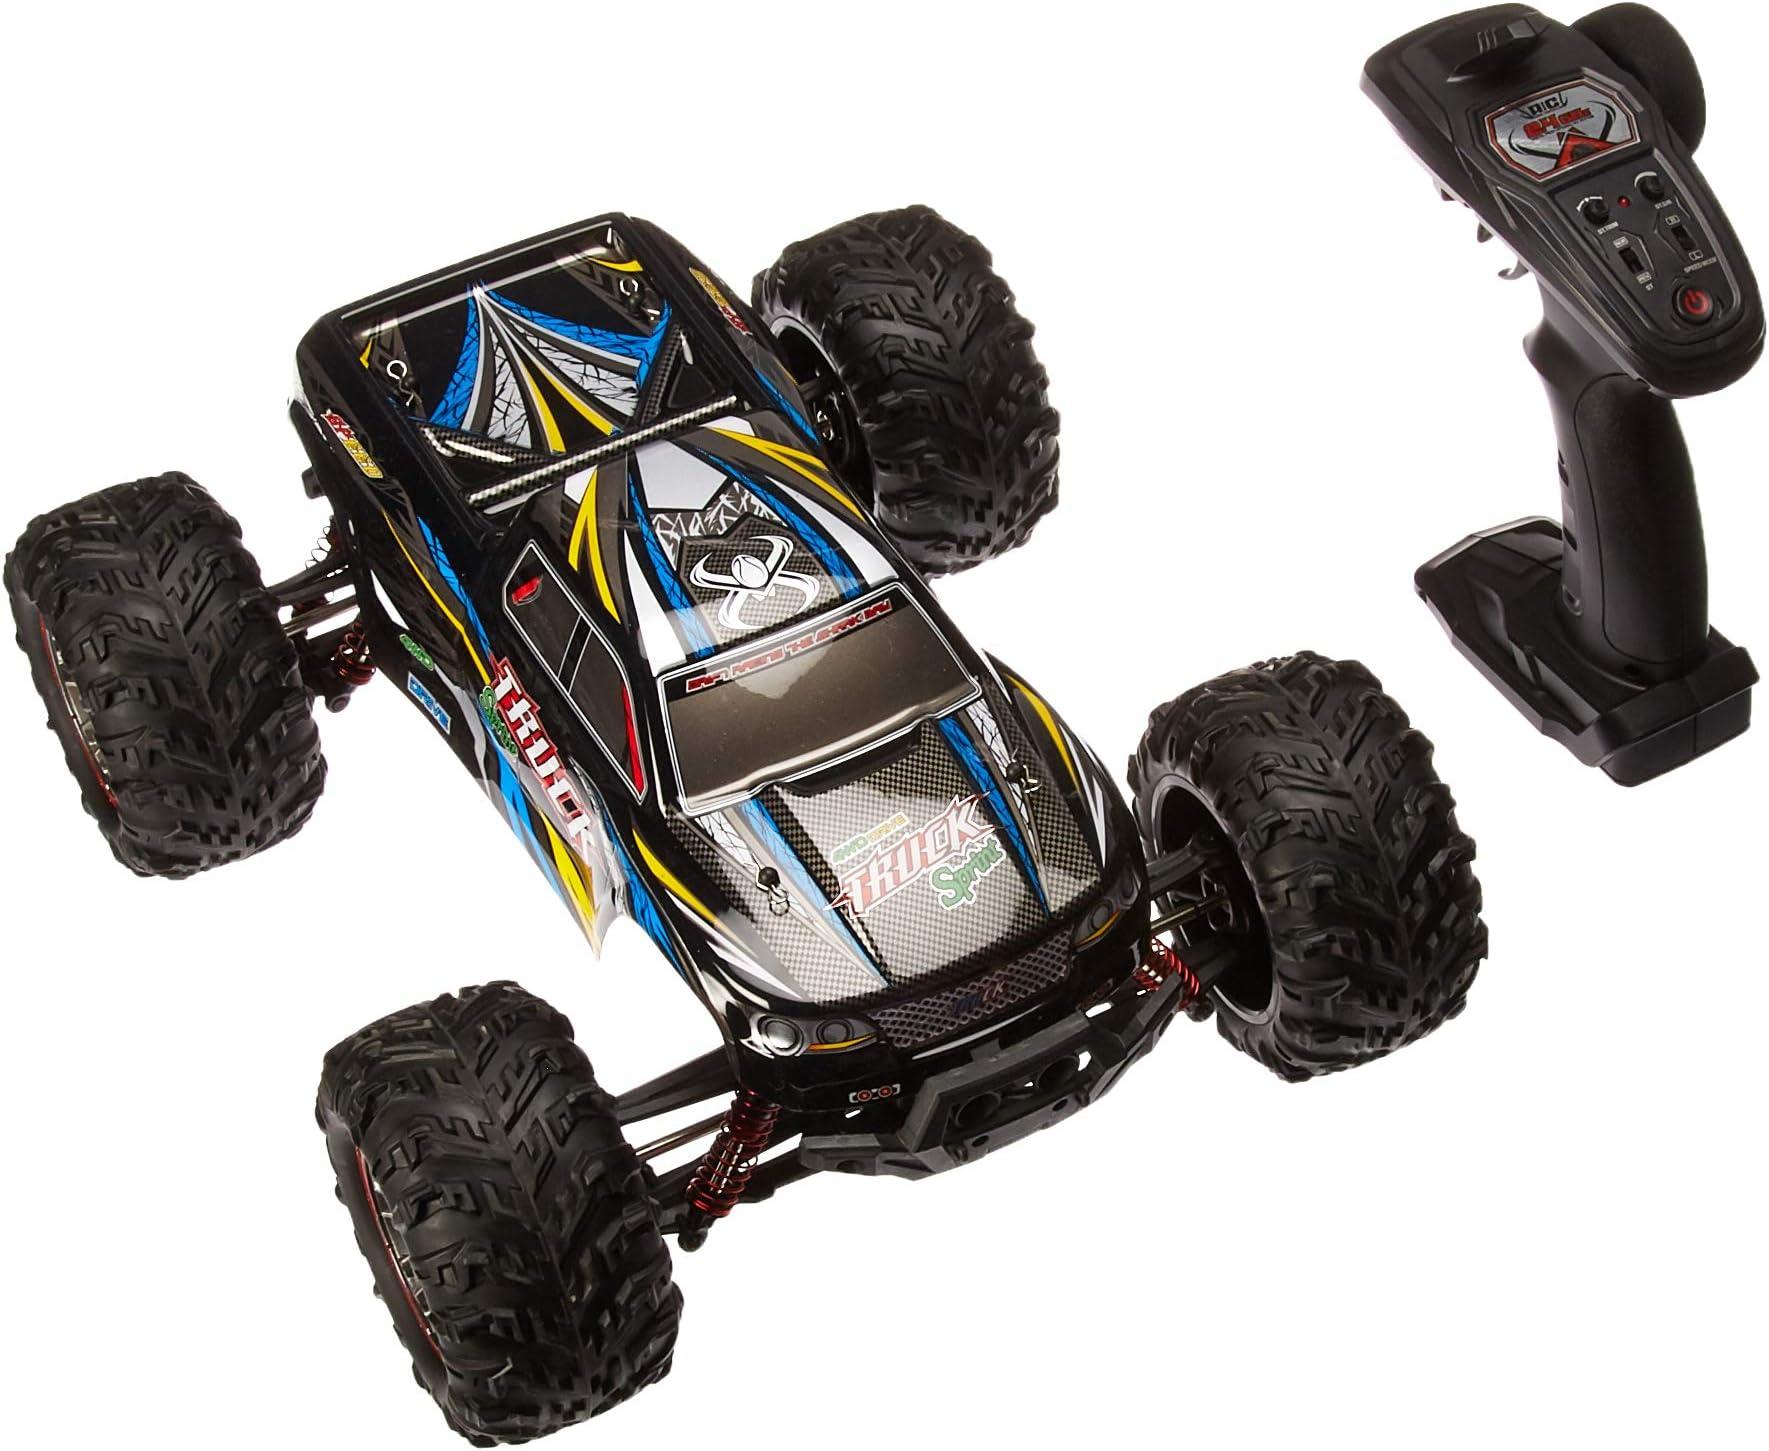 amazon com cars remote \u0026 app controlled vehicles toys \u0026 gameshosim large size 1 10 scale high speed 46km h 4wd 2 4ghz remote